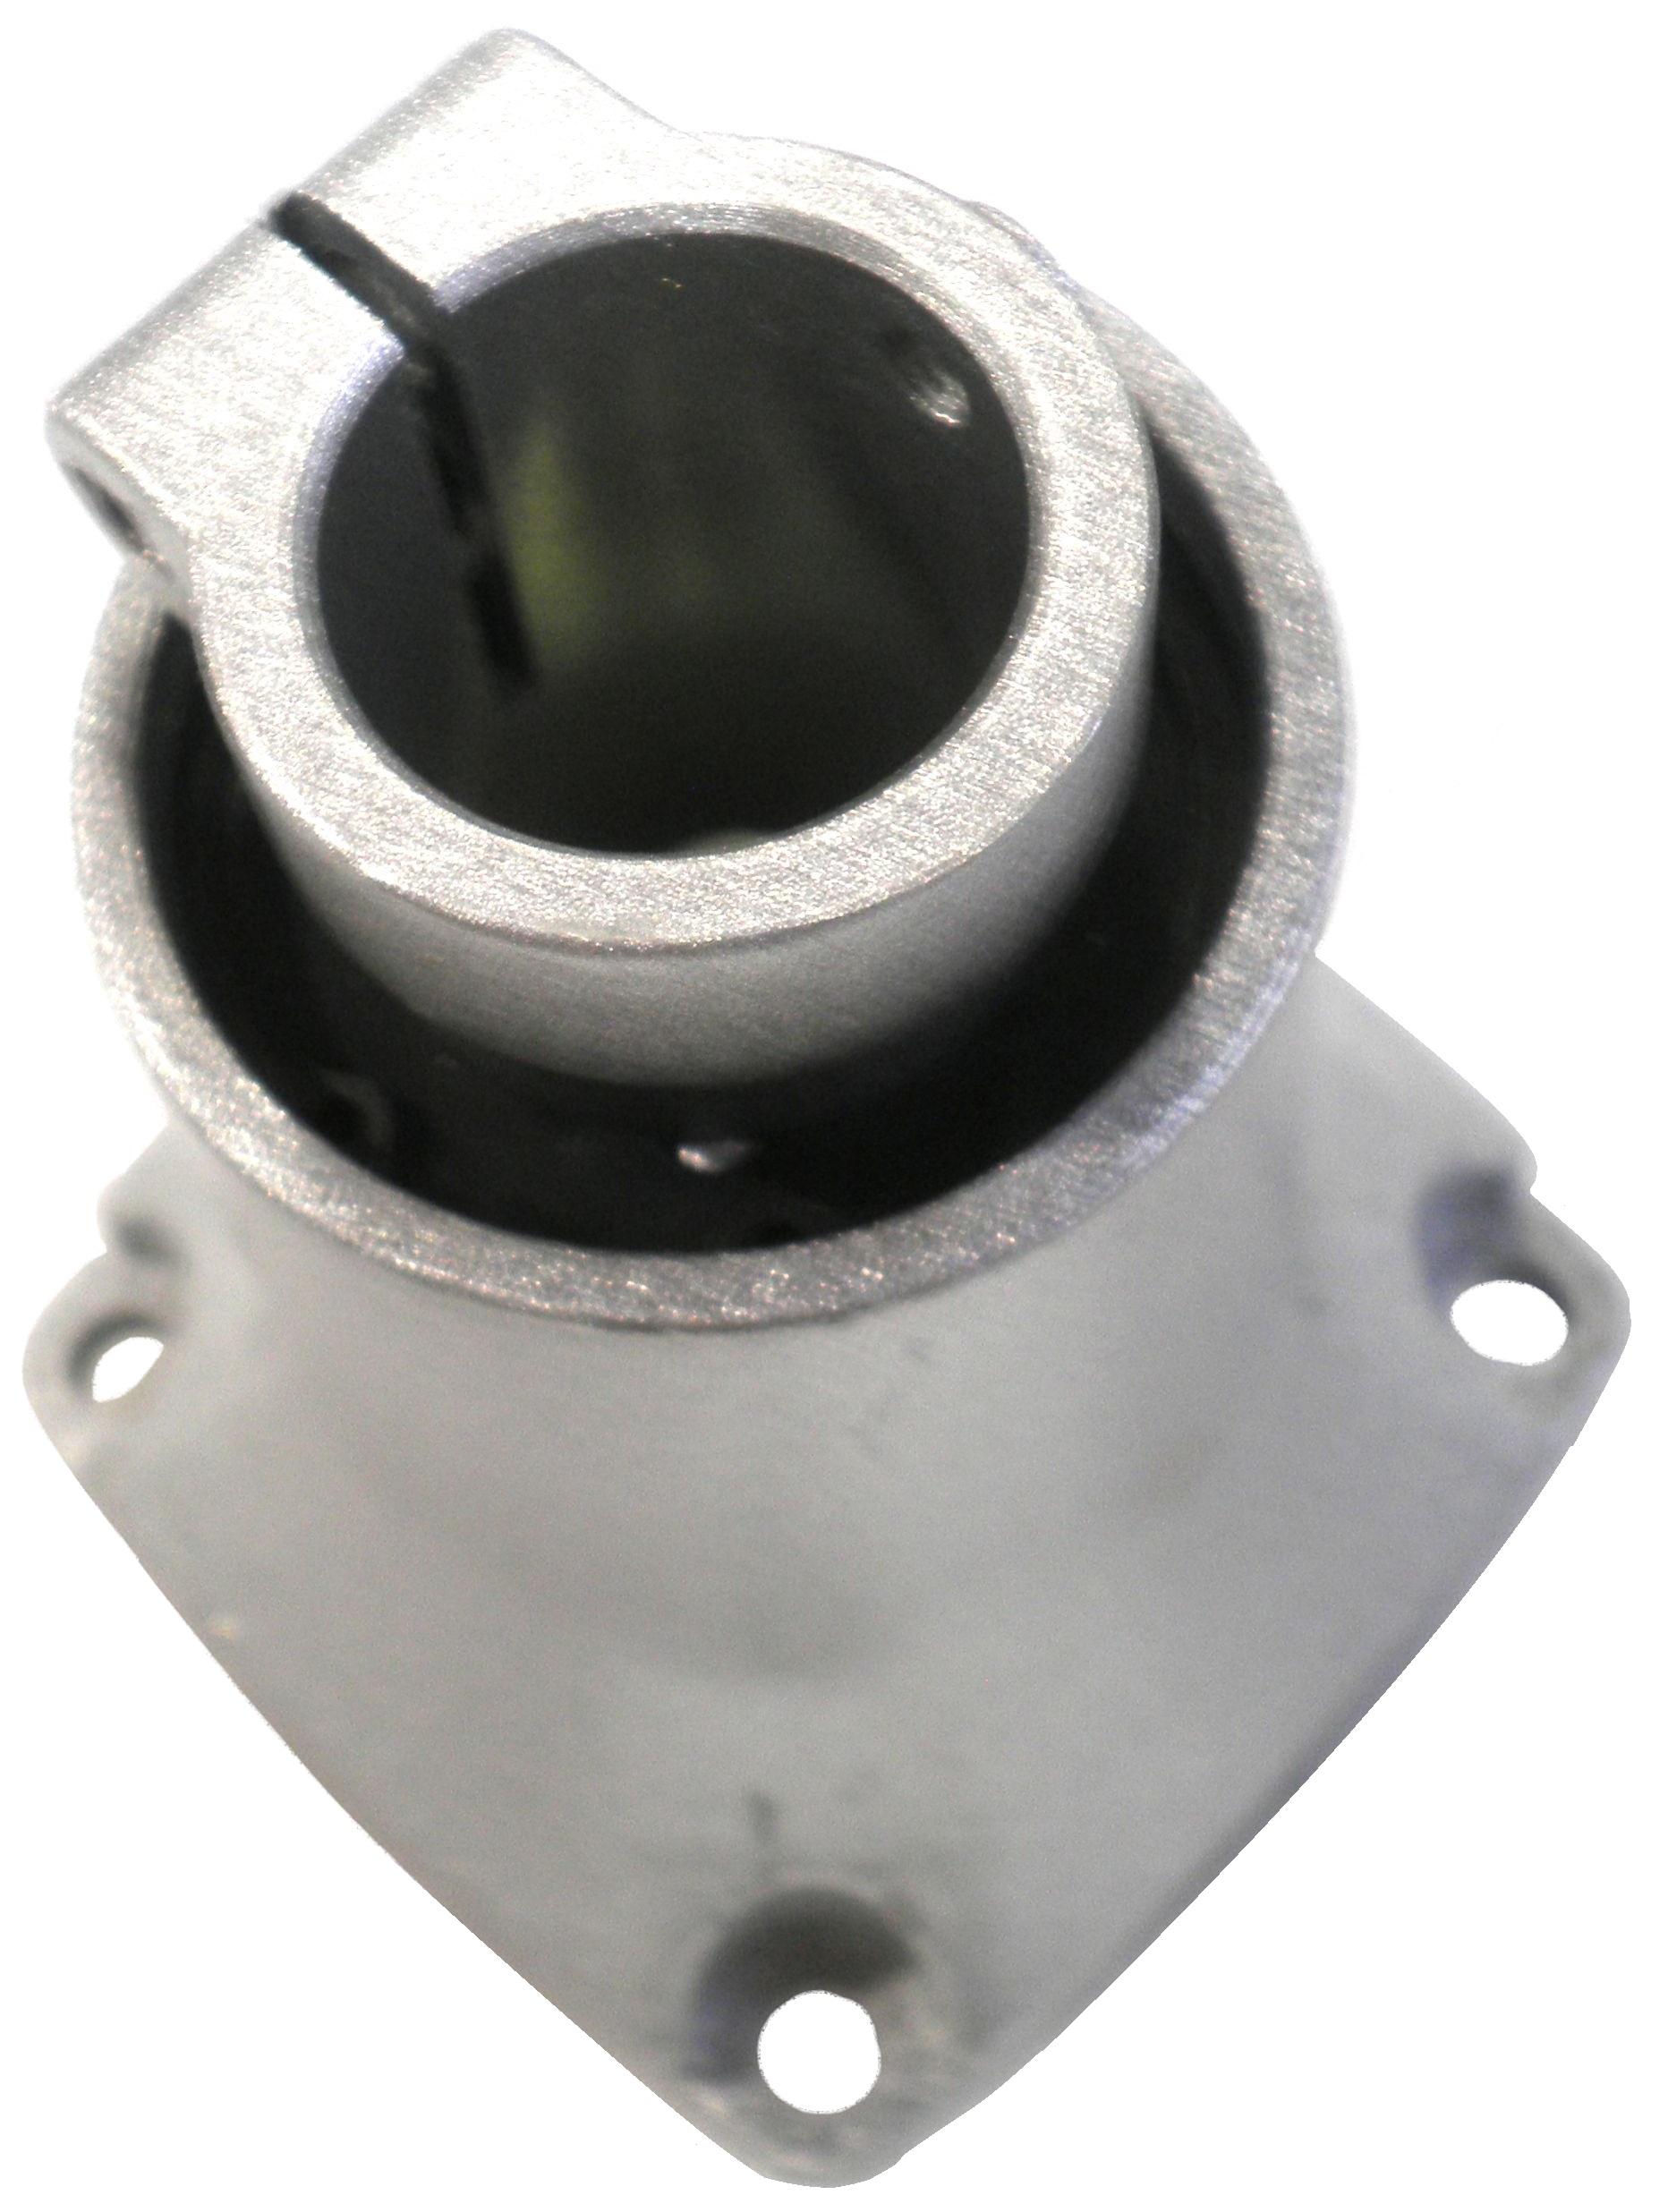 Comprar Carcaca de acoplamento 30mm itc-254 motopoda cpl